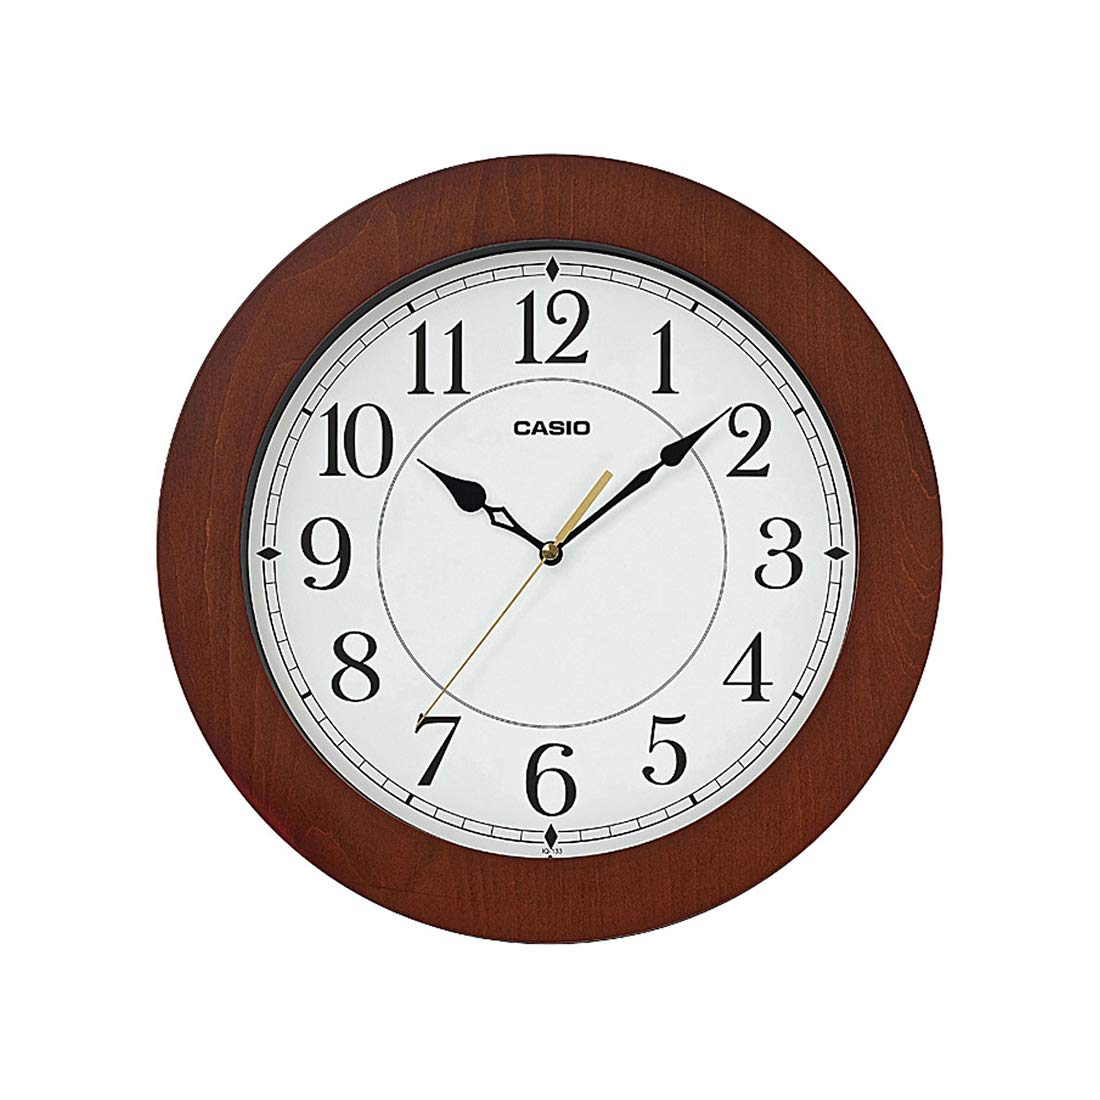 Casio Round Resin Wall Clock